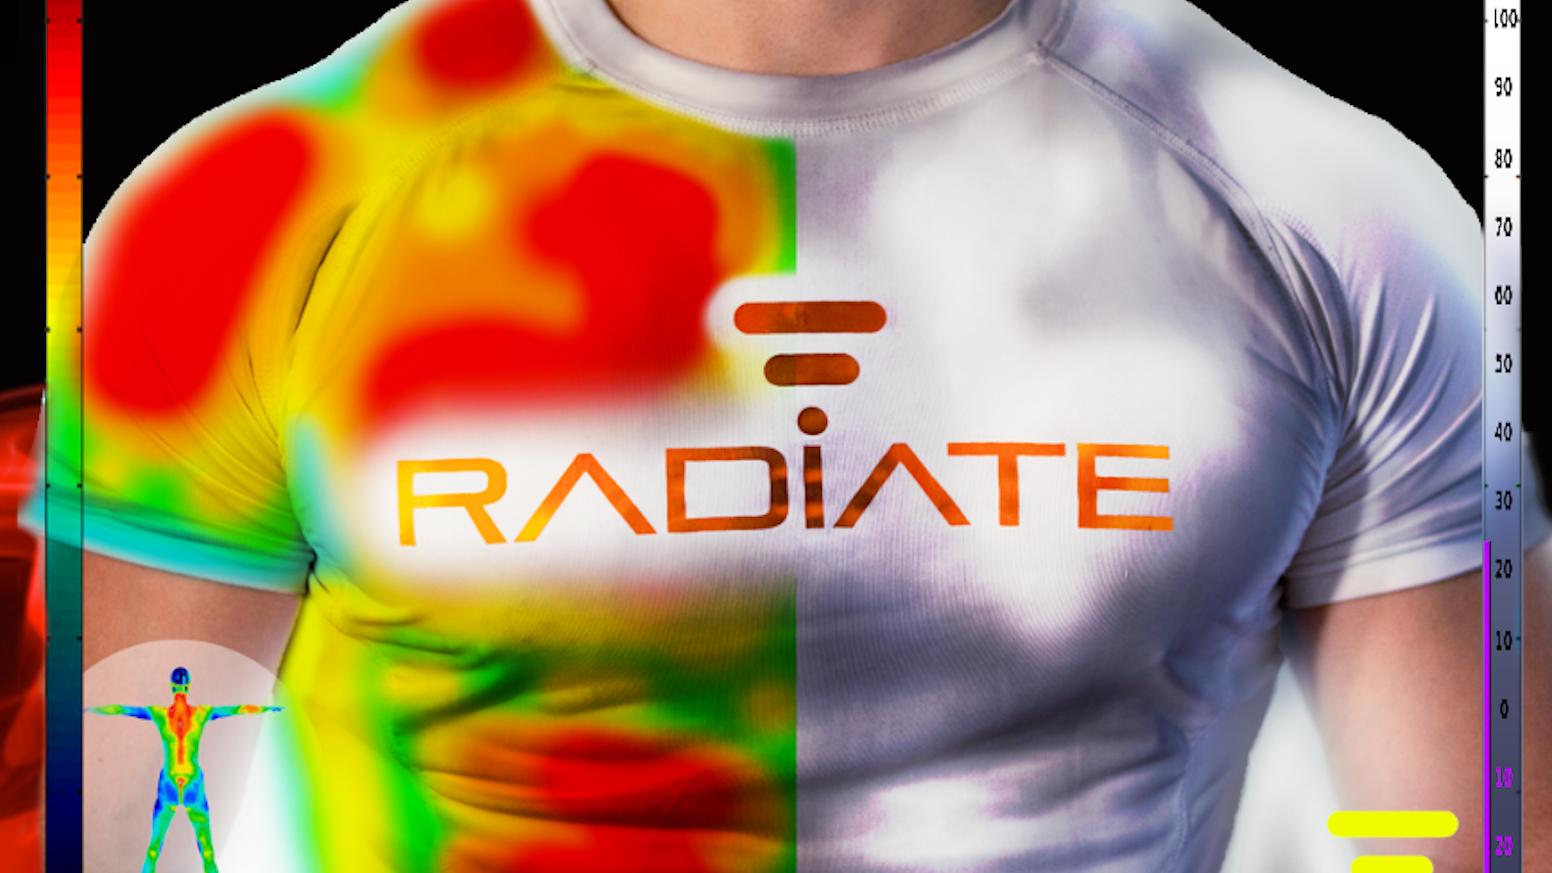 974f5303a7e2f Radiate Athletics  The Future of Sports Apparel. No sweat  advanced workout  shirt ...